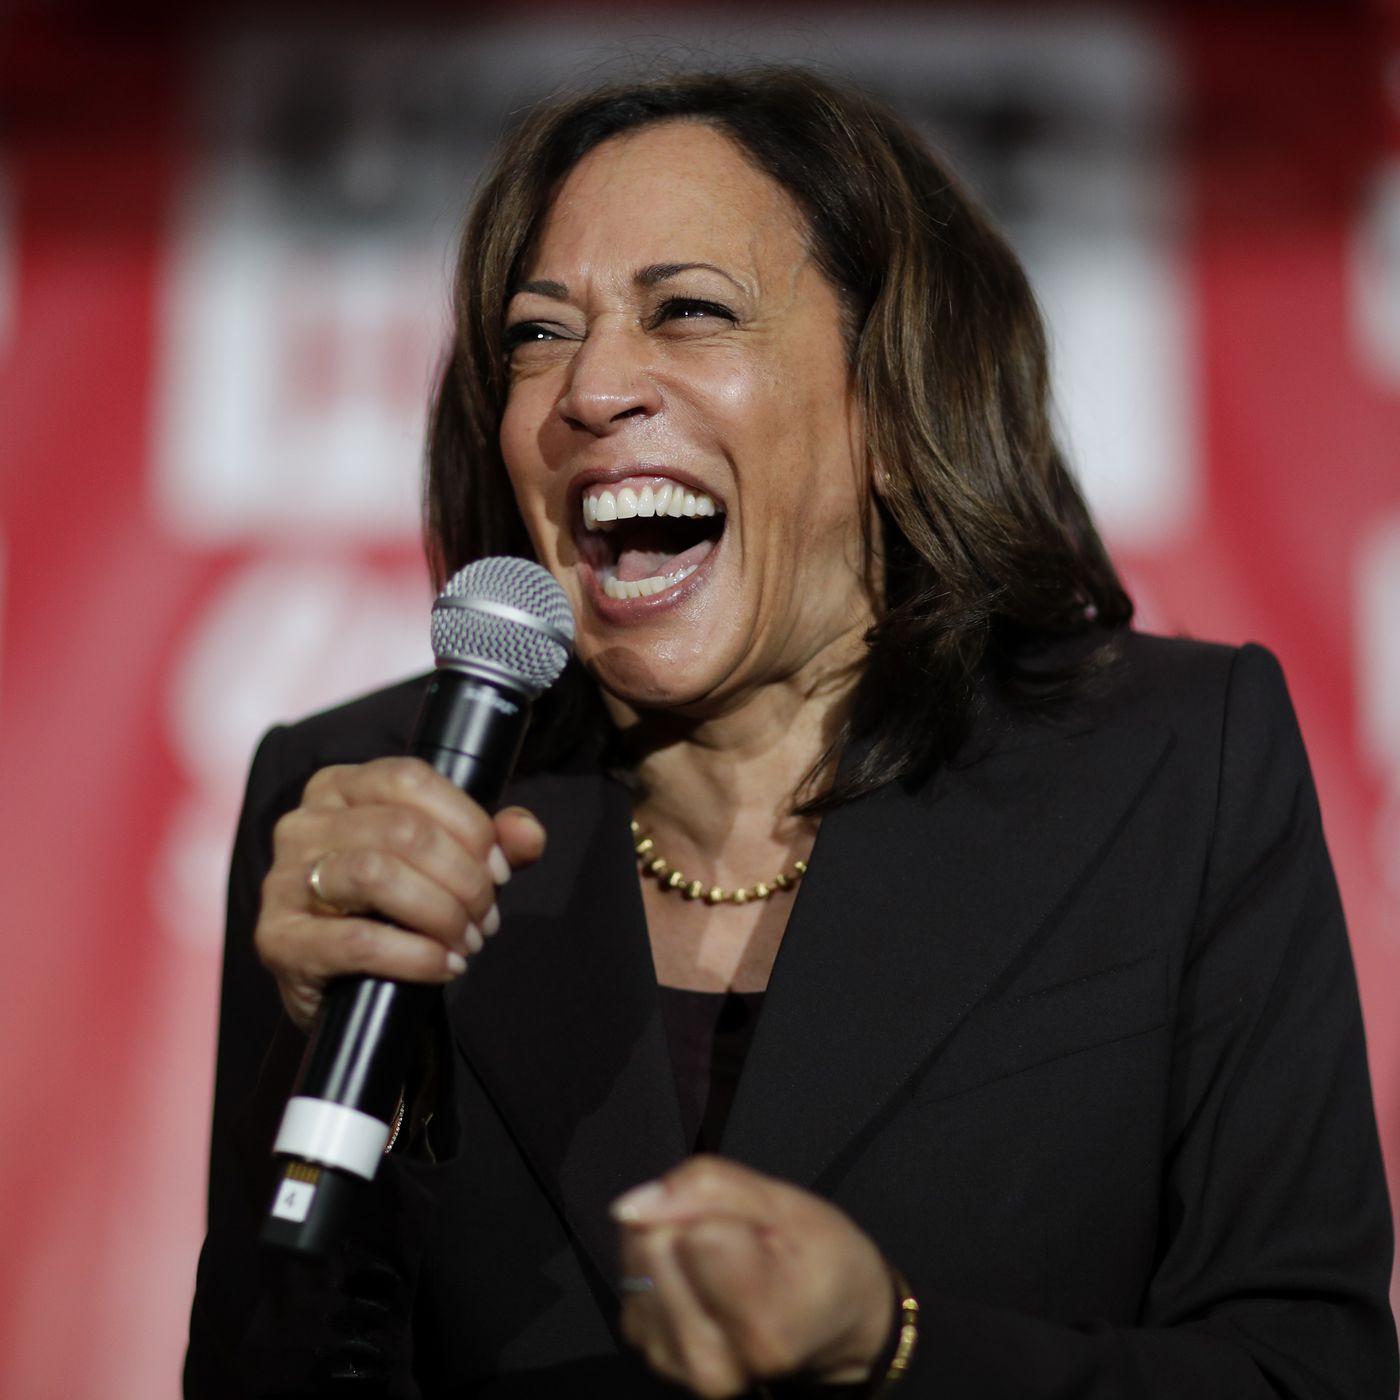 Barack Obama, LeBron James, and more respond to Kamala Harris as VP pick